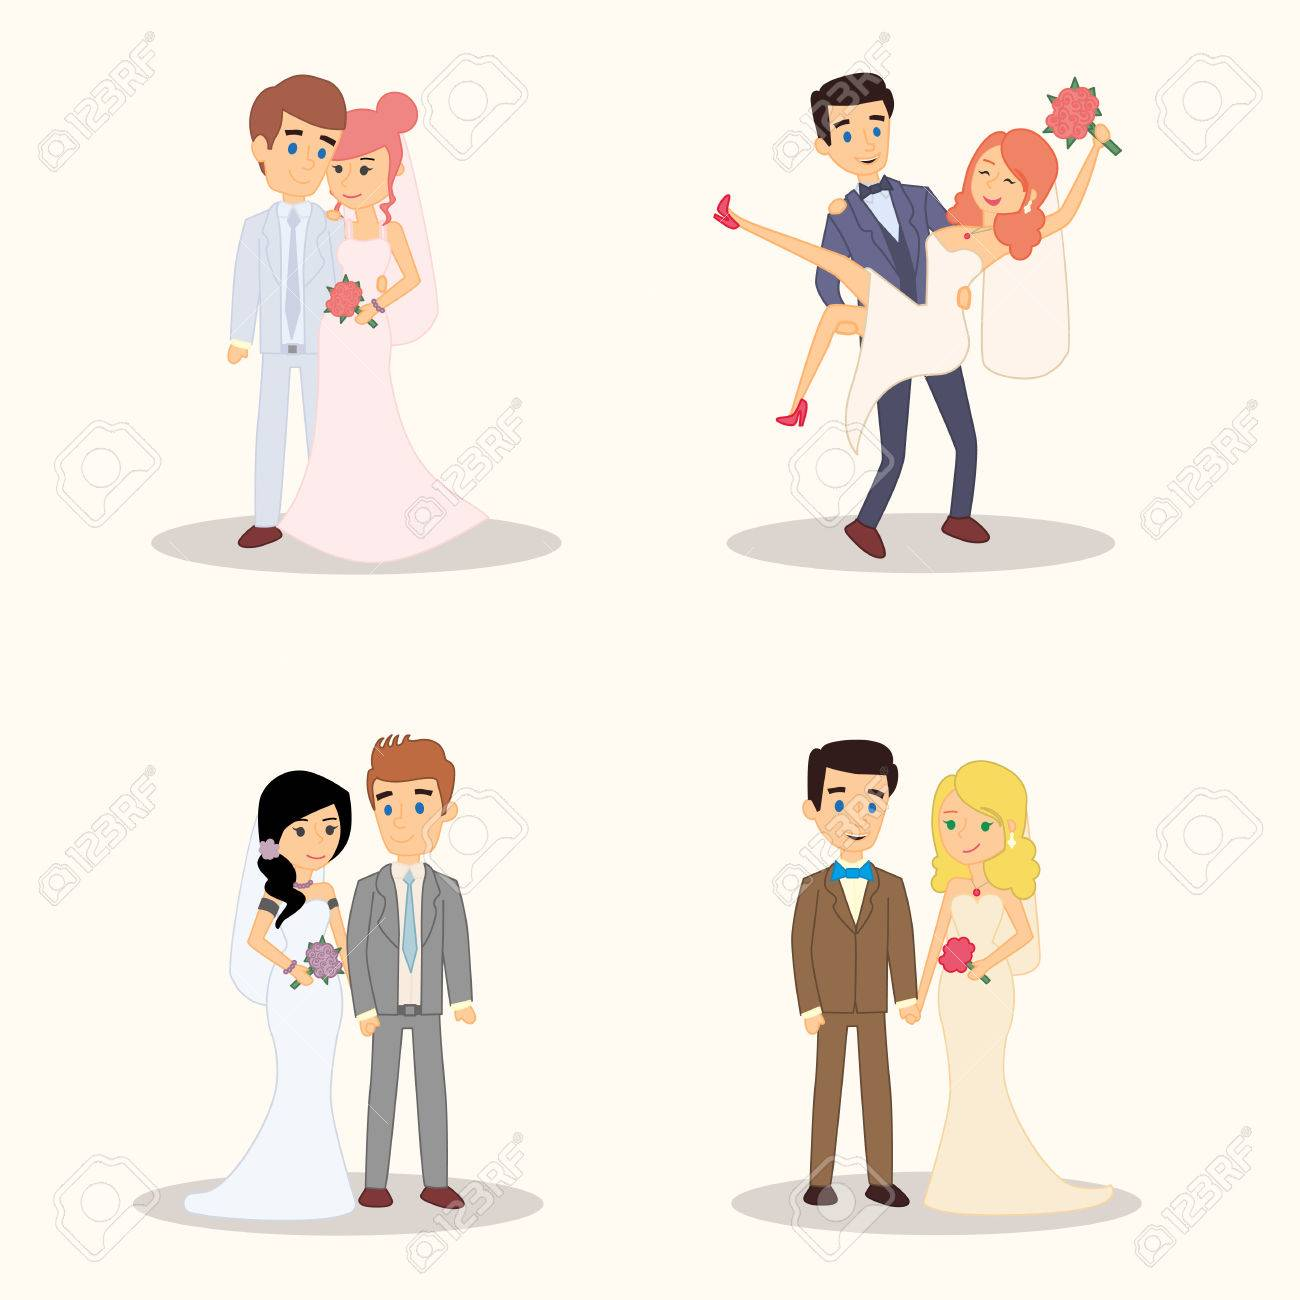 Wedding couple cartoon characters set vector illustrations for wedding couple cartoon characters set vector illustrations for invitation greeting card design t kristyandbryce Gallery